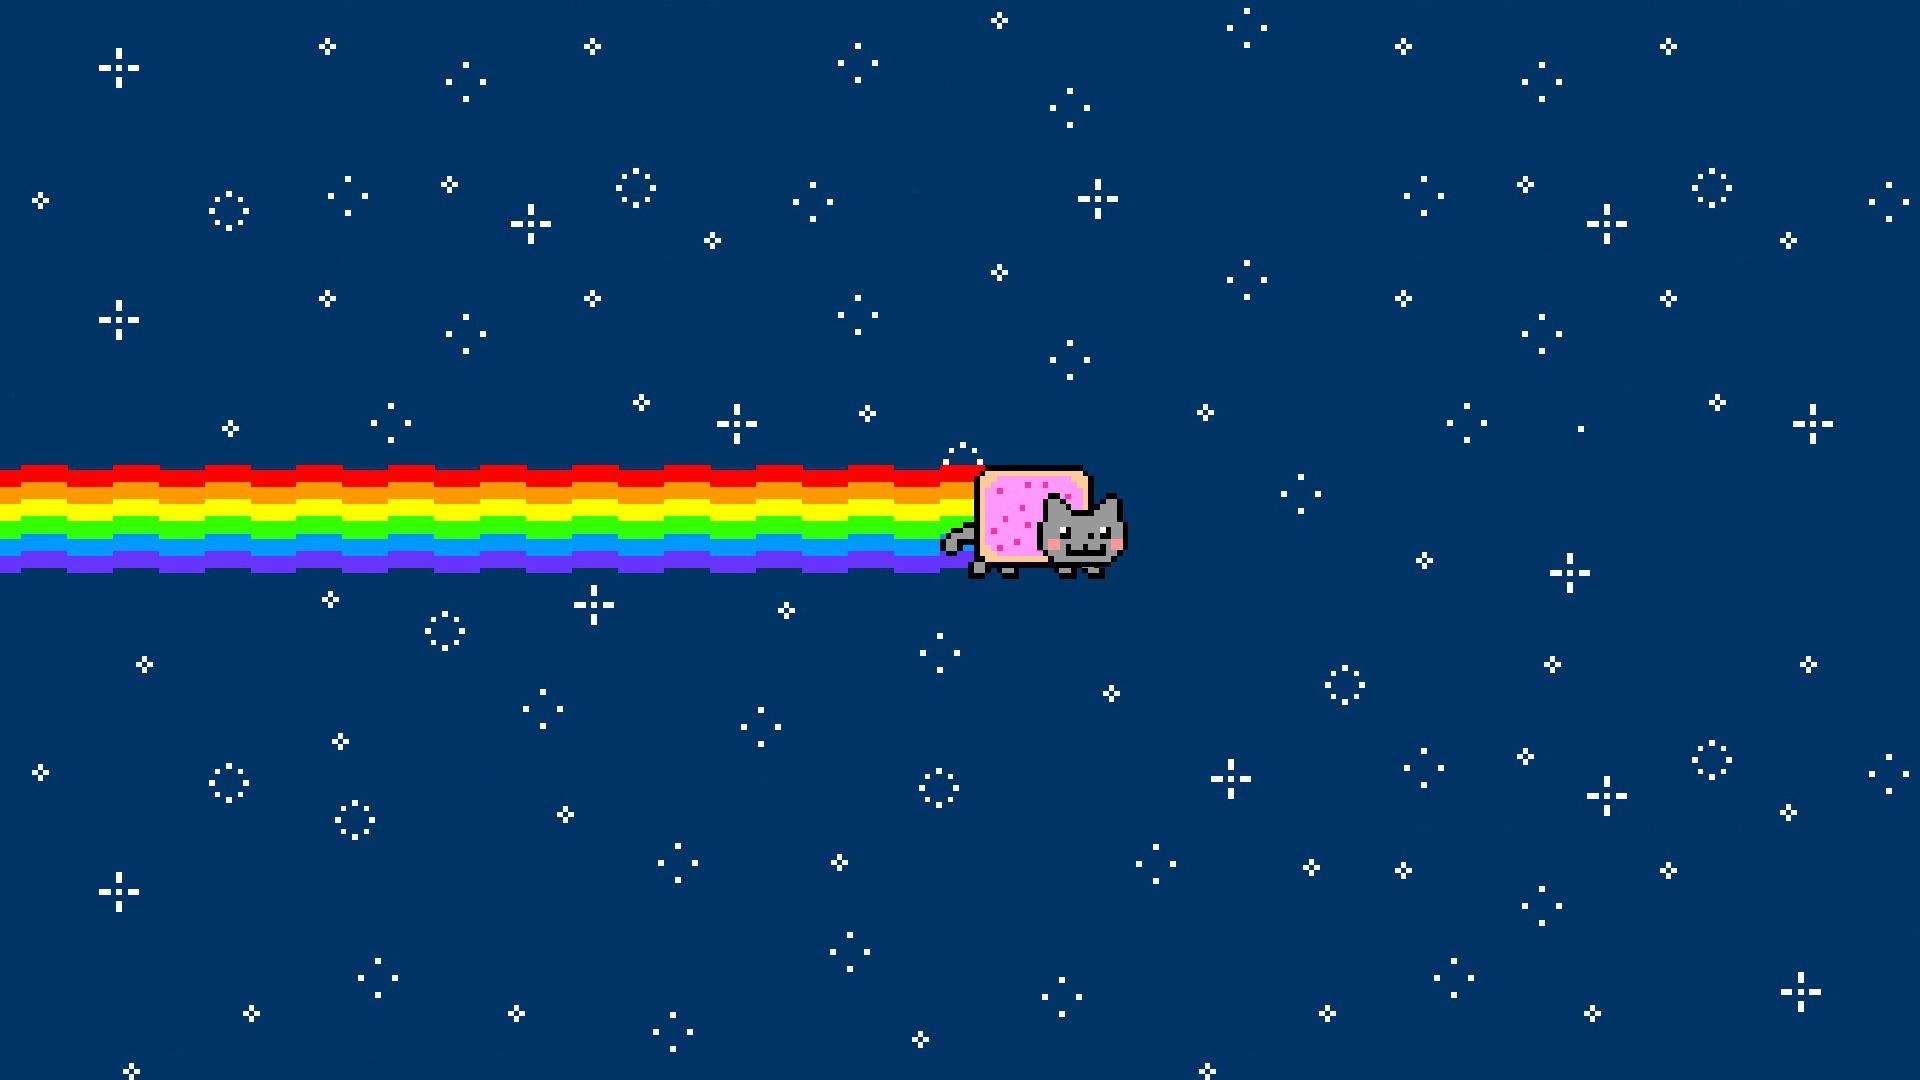 Full Screen Fall Wallpaper Nyan Cat Wallpapers Free Download Pixelstalk Net